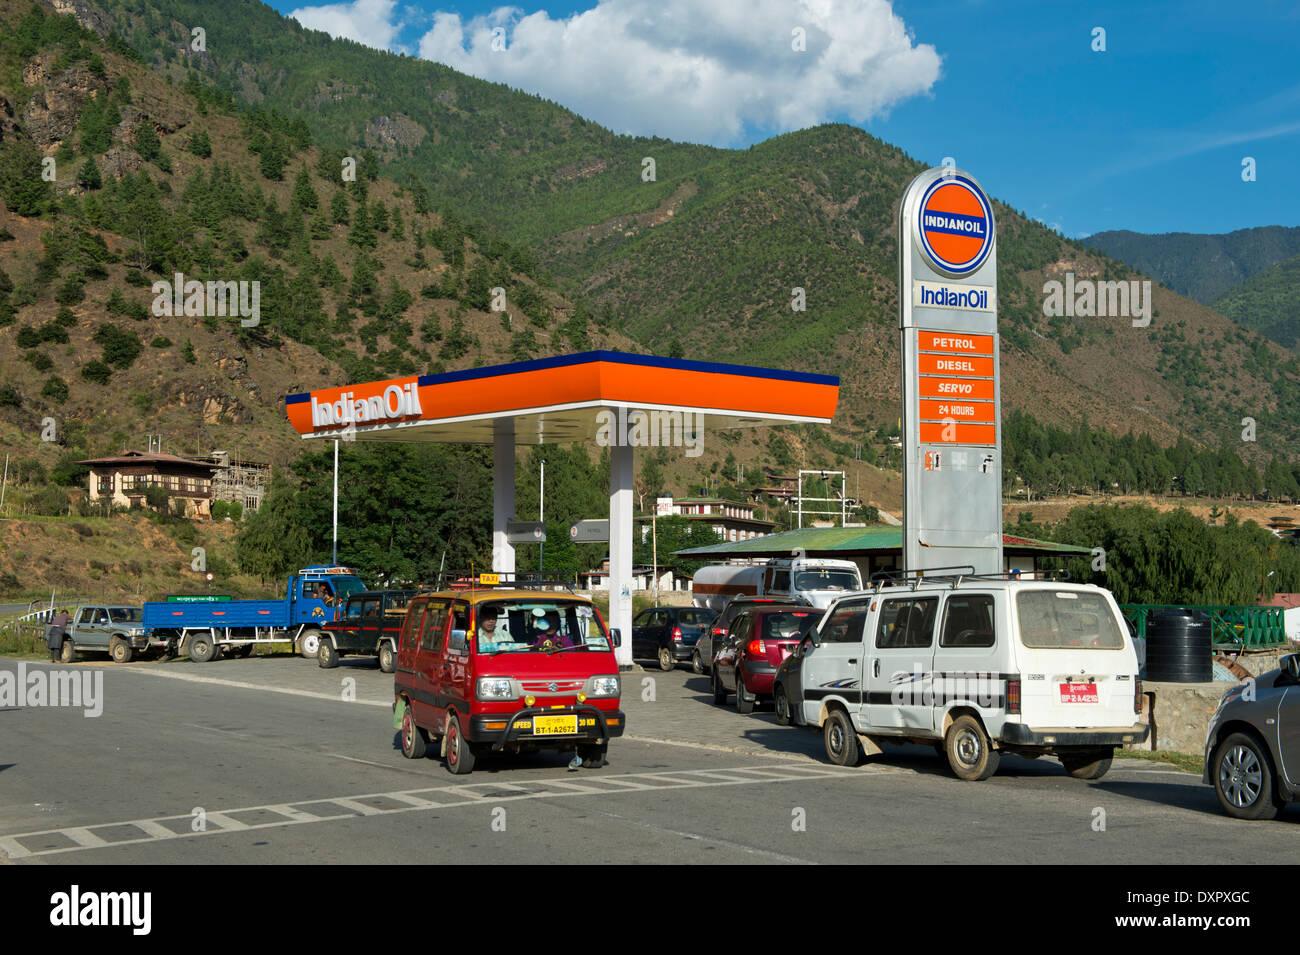 Petrol station of the Indian Oil Corporation, Paro, Bhutan - Stock Image